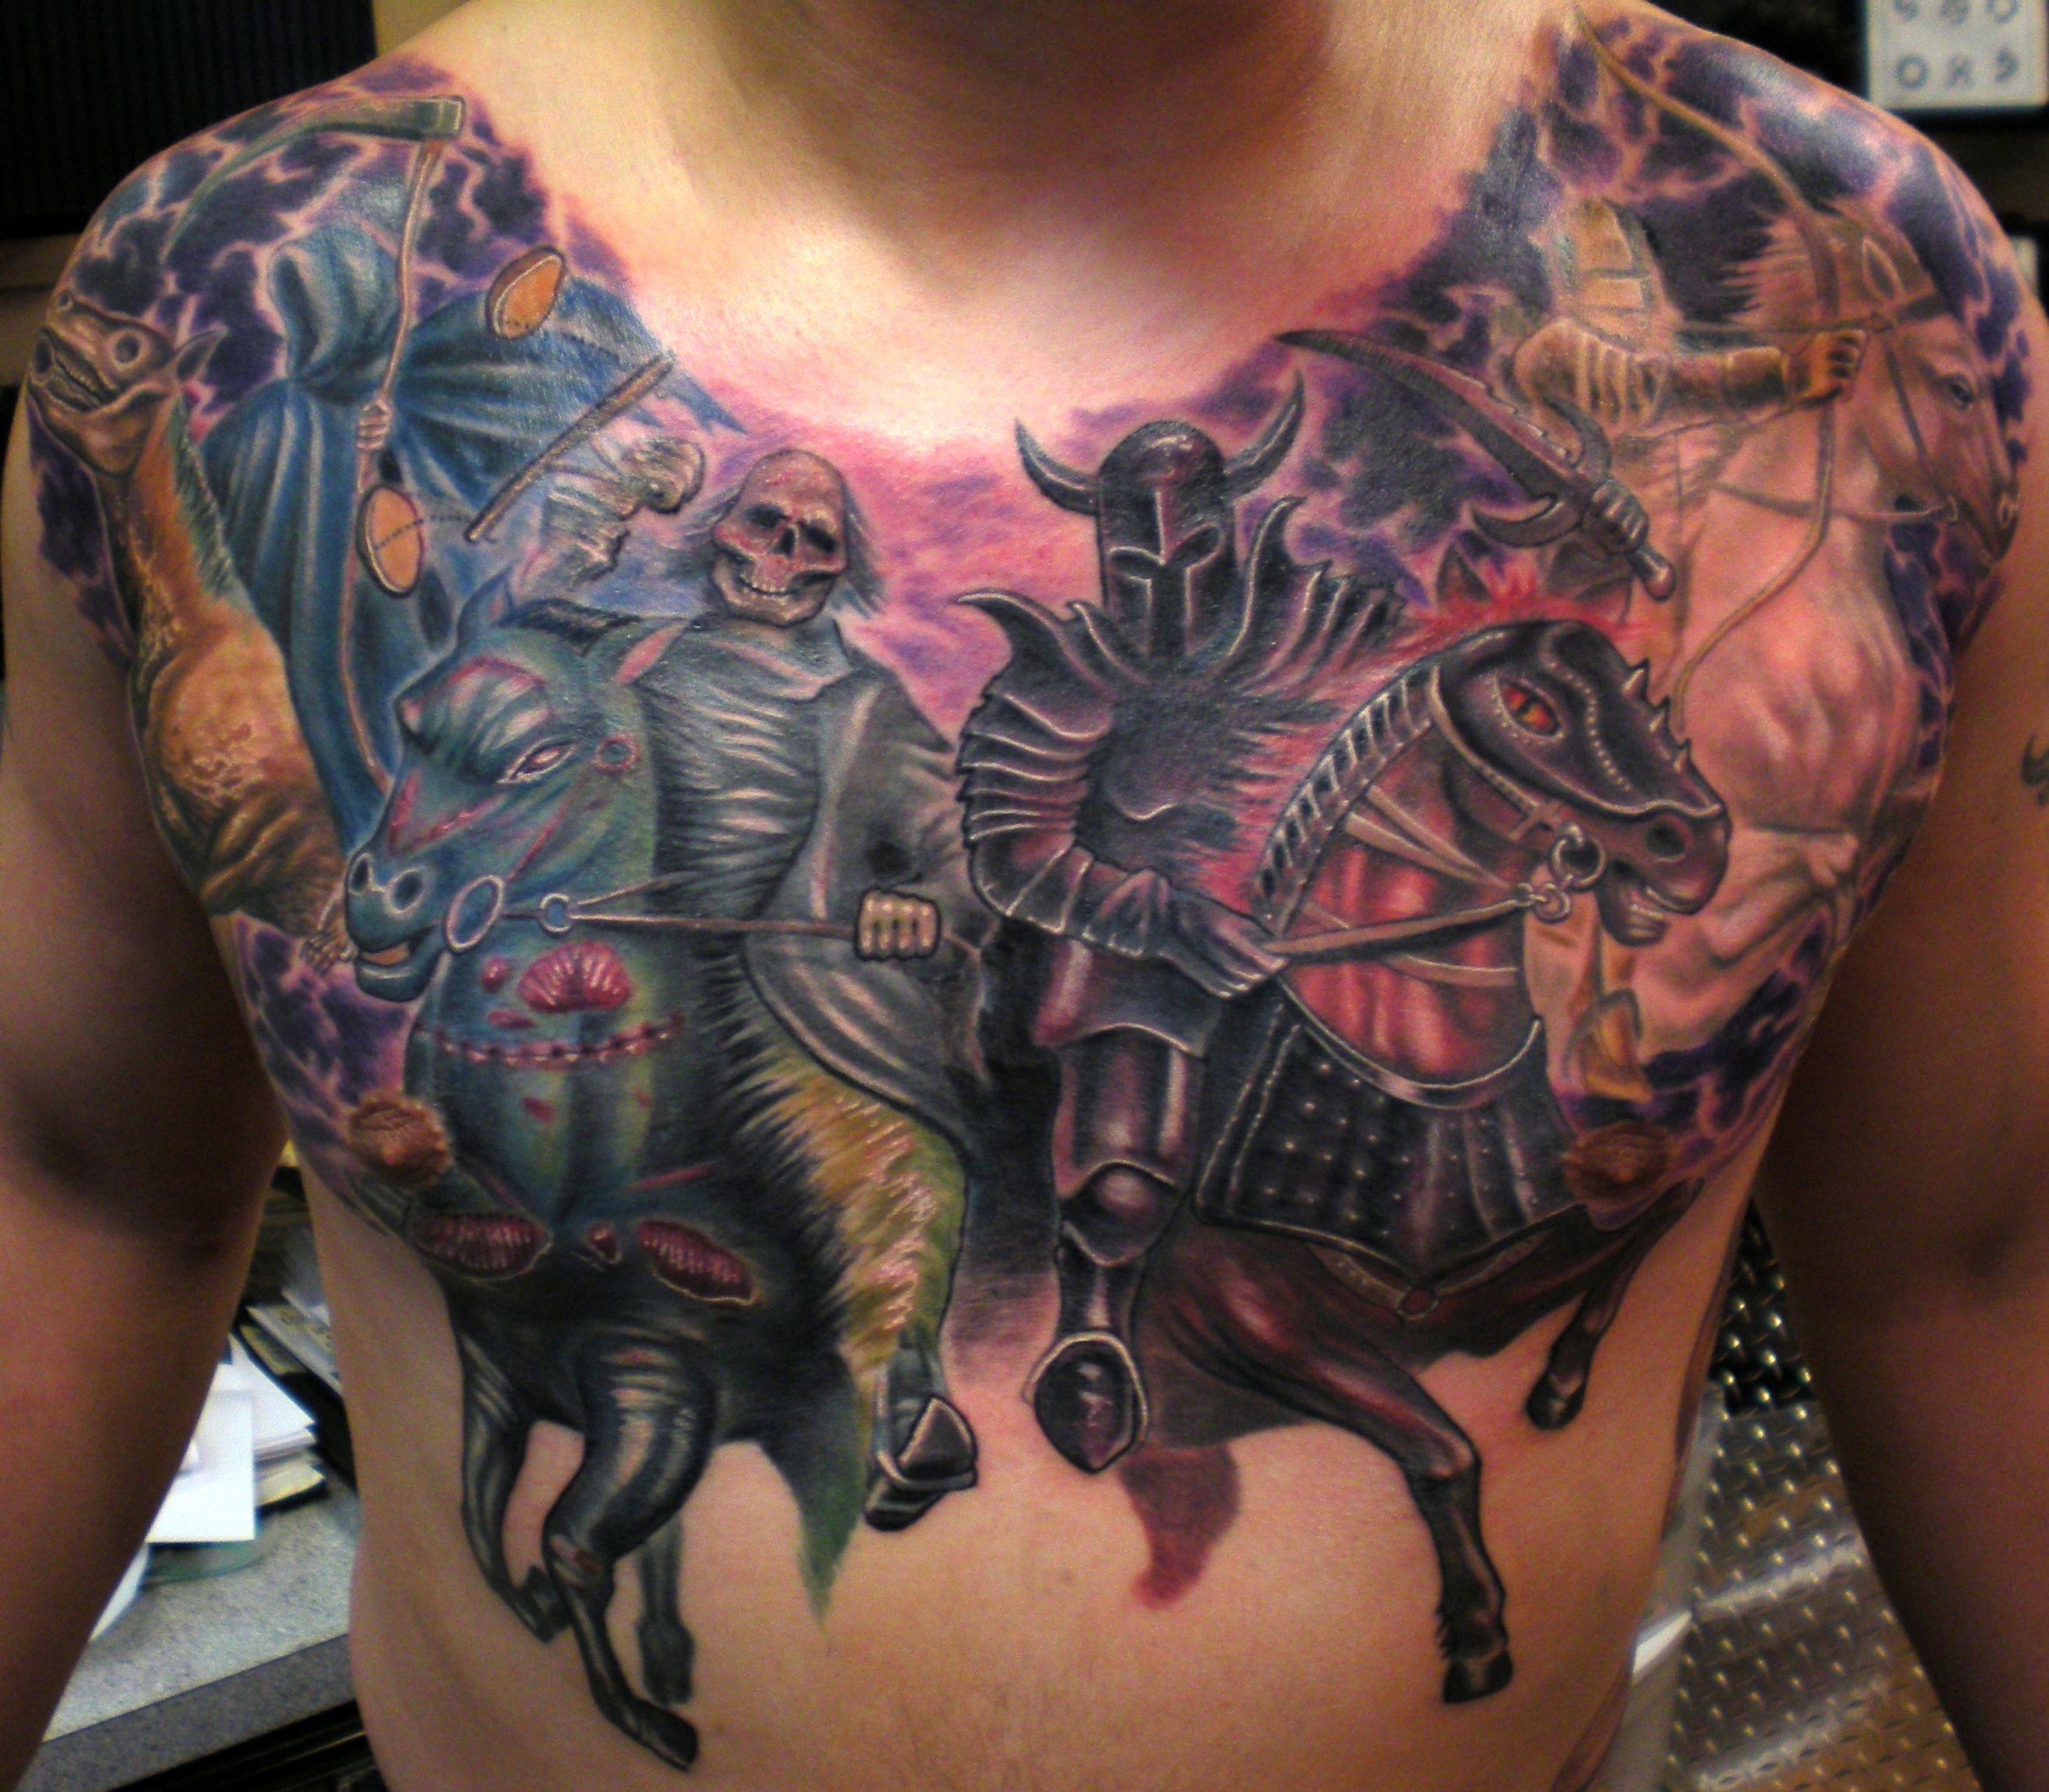 Four Horsemen Chest Tattoo Tattoos Death Tattoo